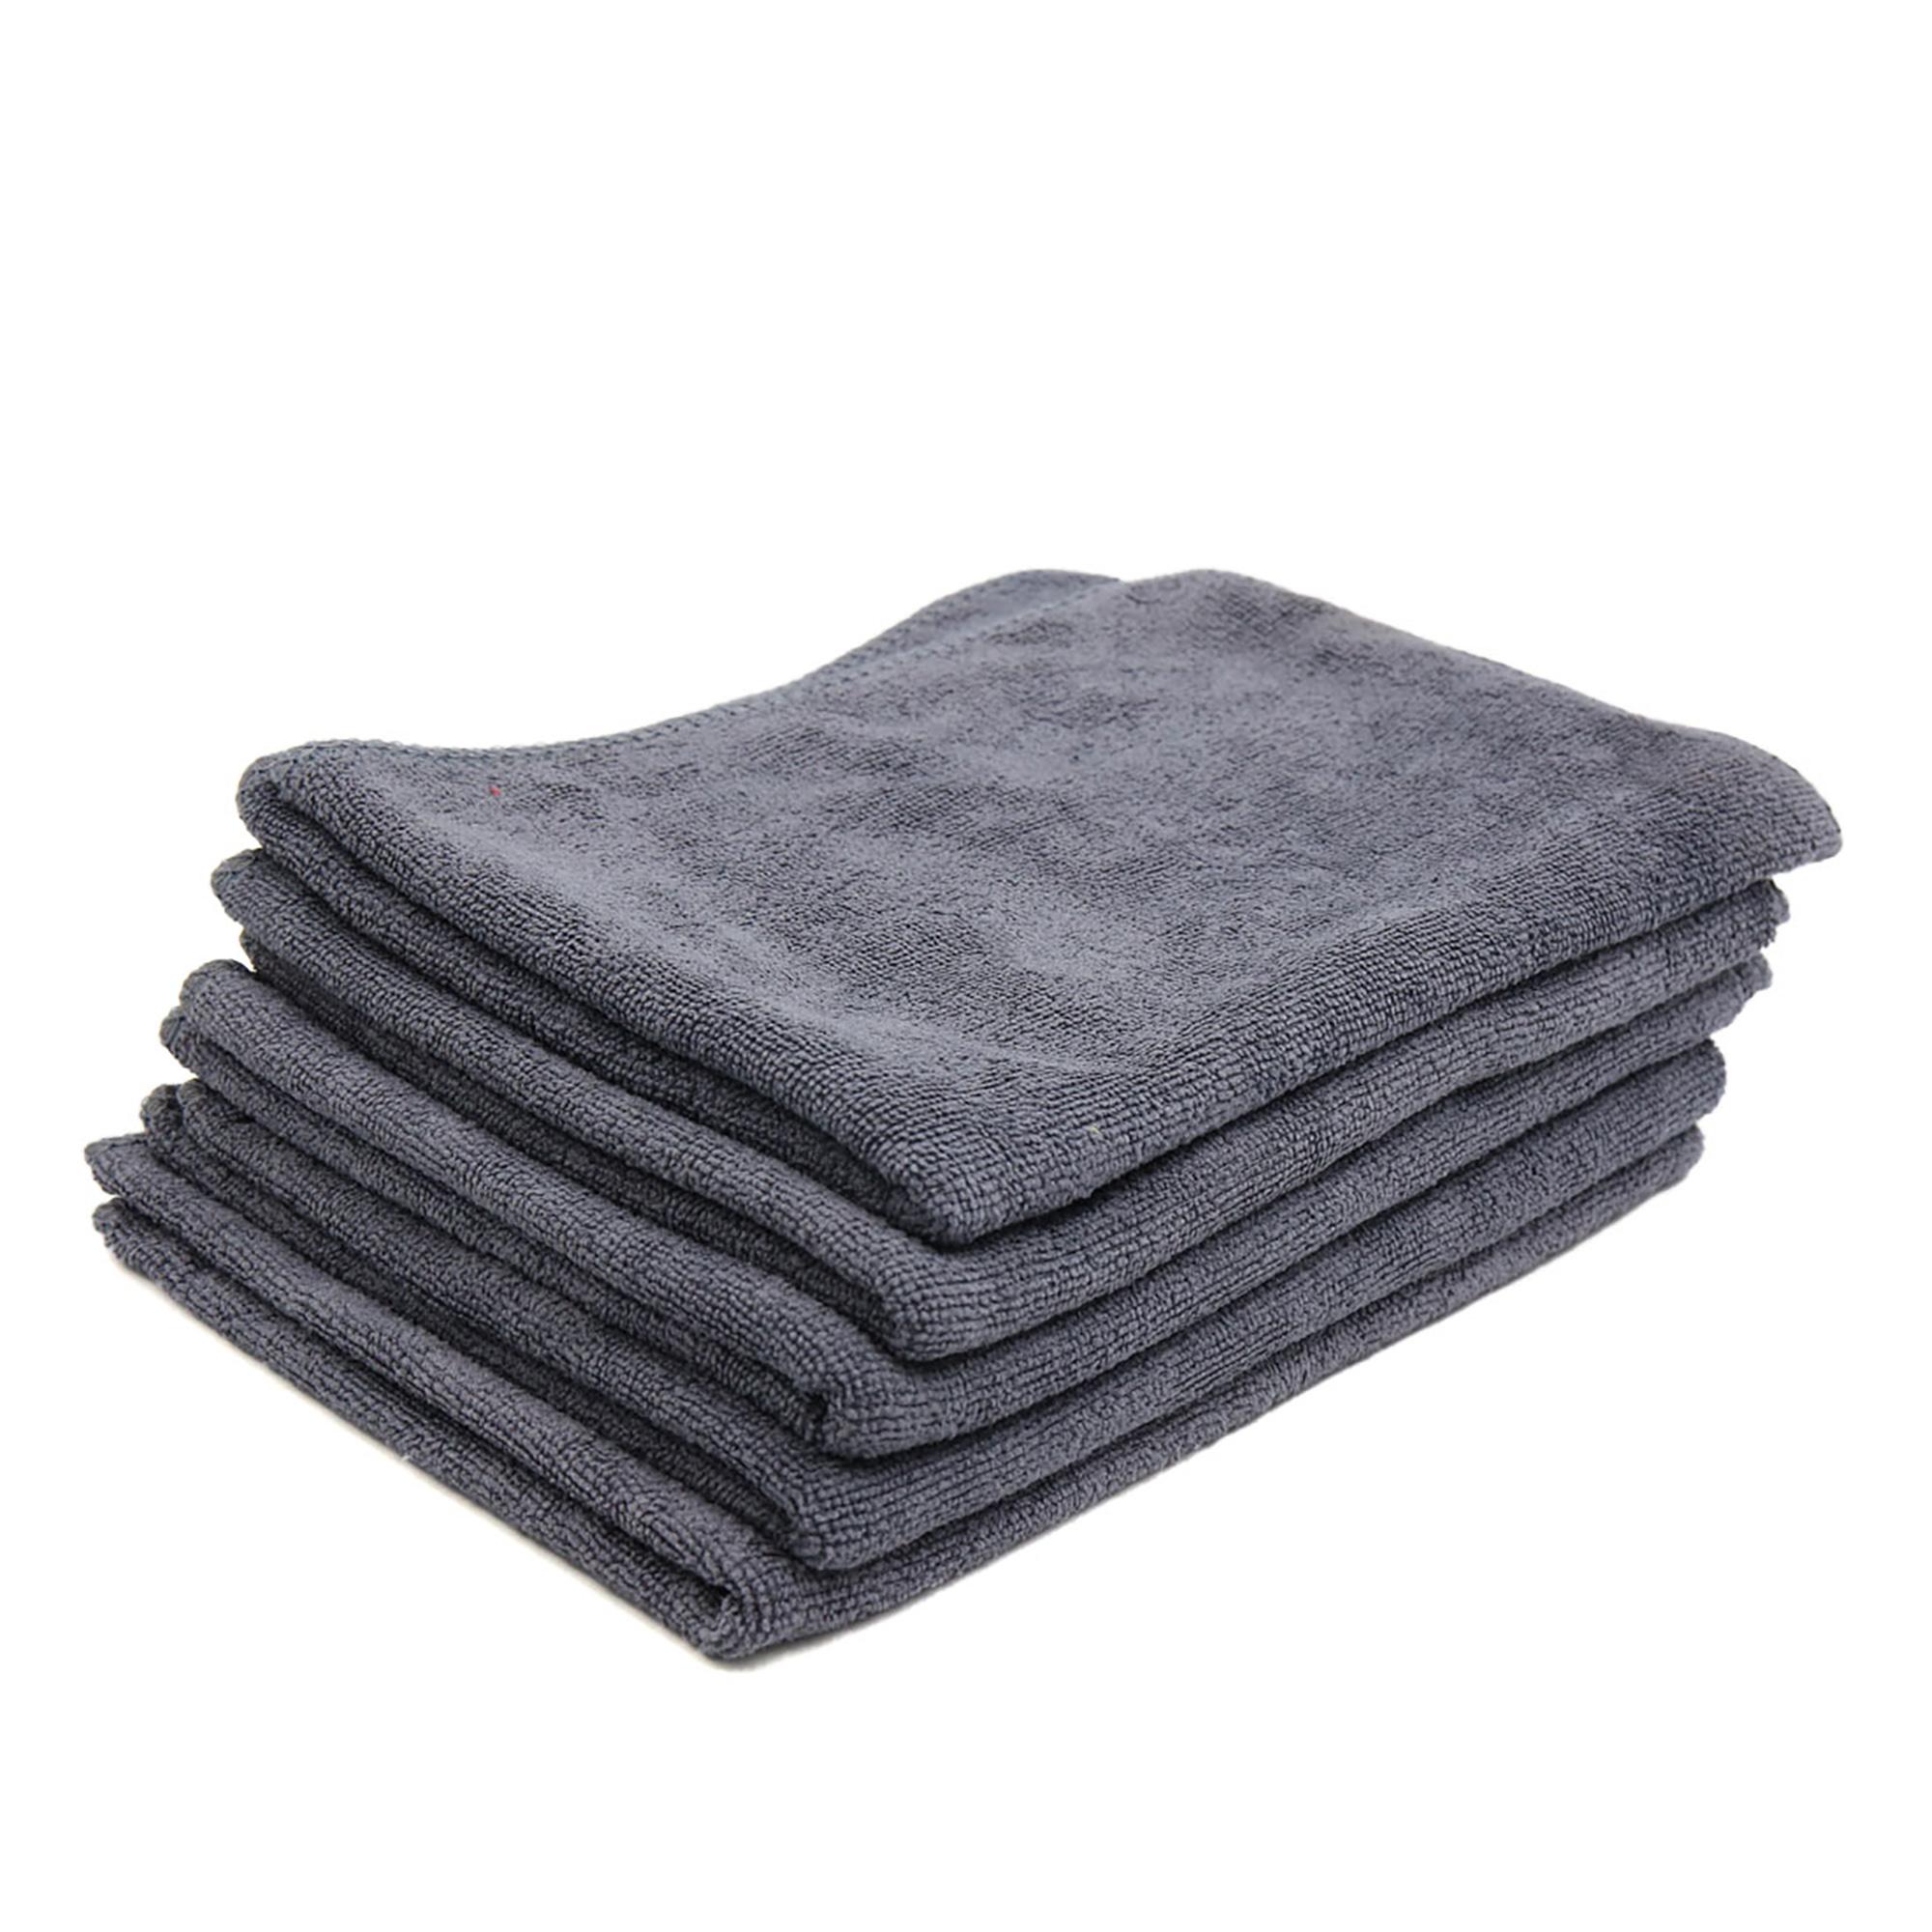 5pcs 65 x 33cm 250GSM Microfiber Towel Clean Cloths for Car Washing Gray